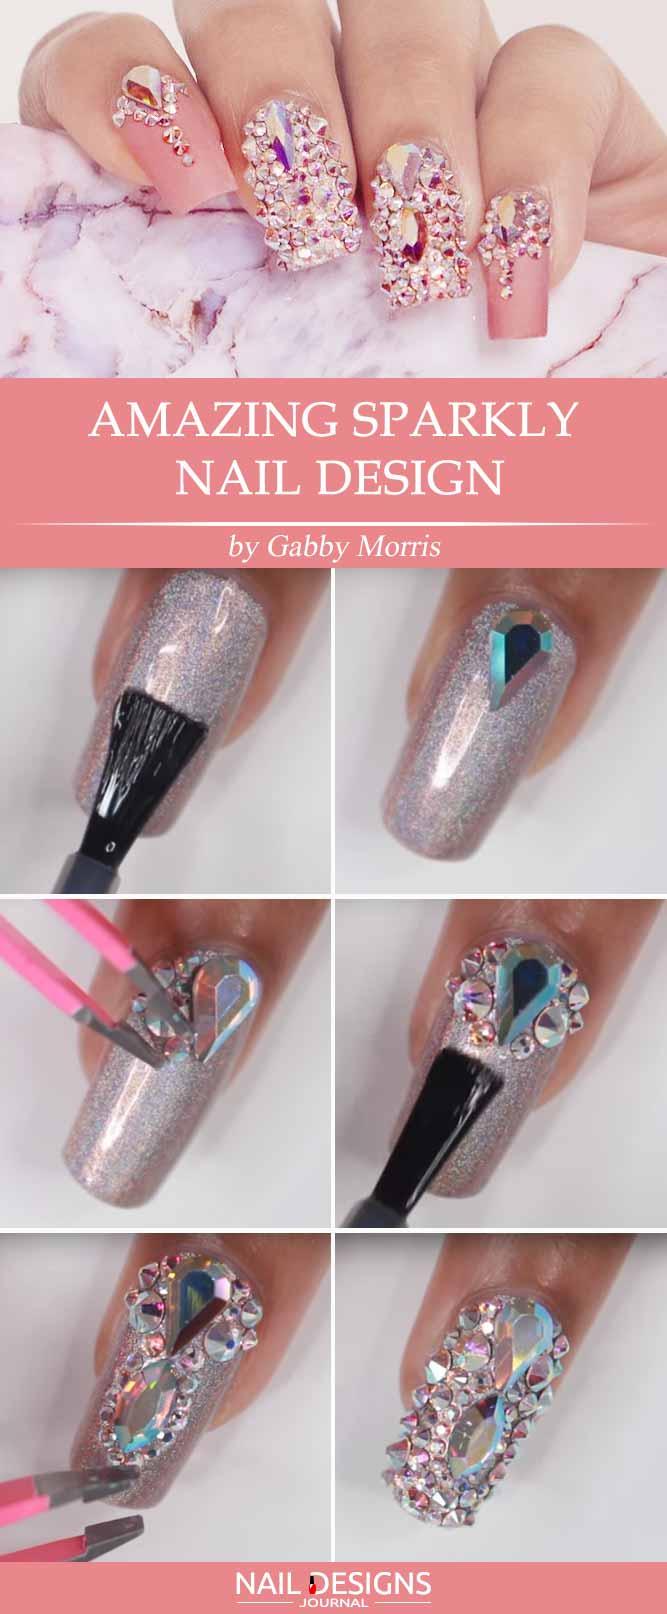 Amazing Sparkly Nail Design